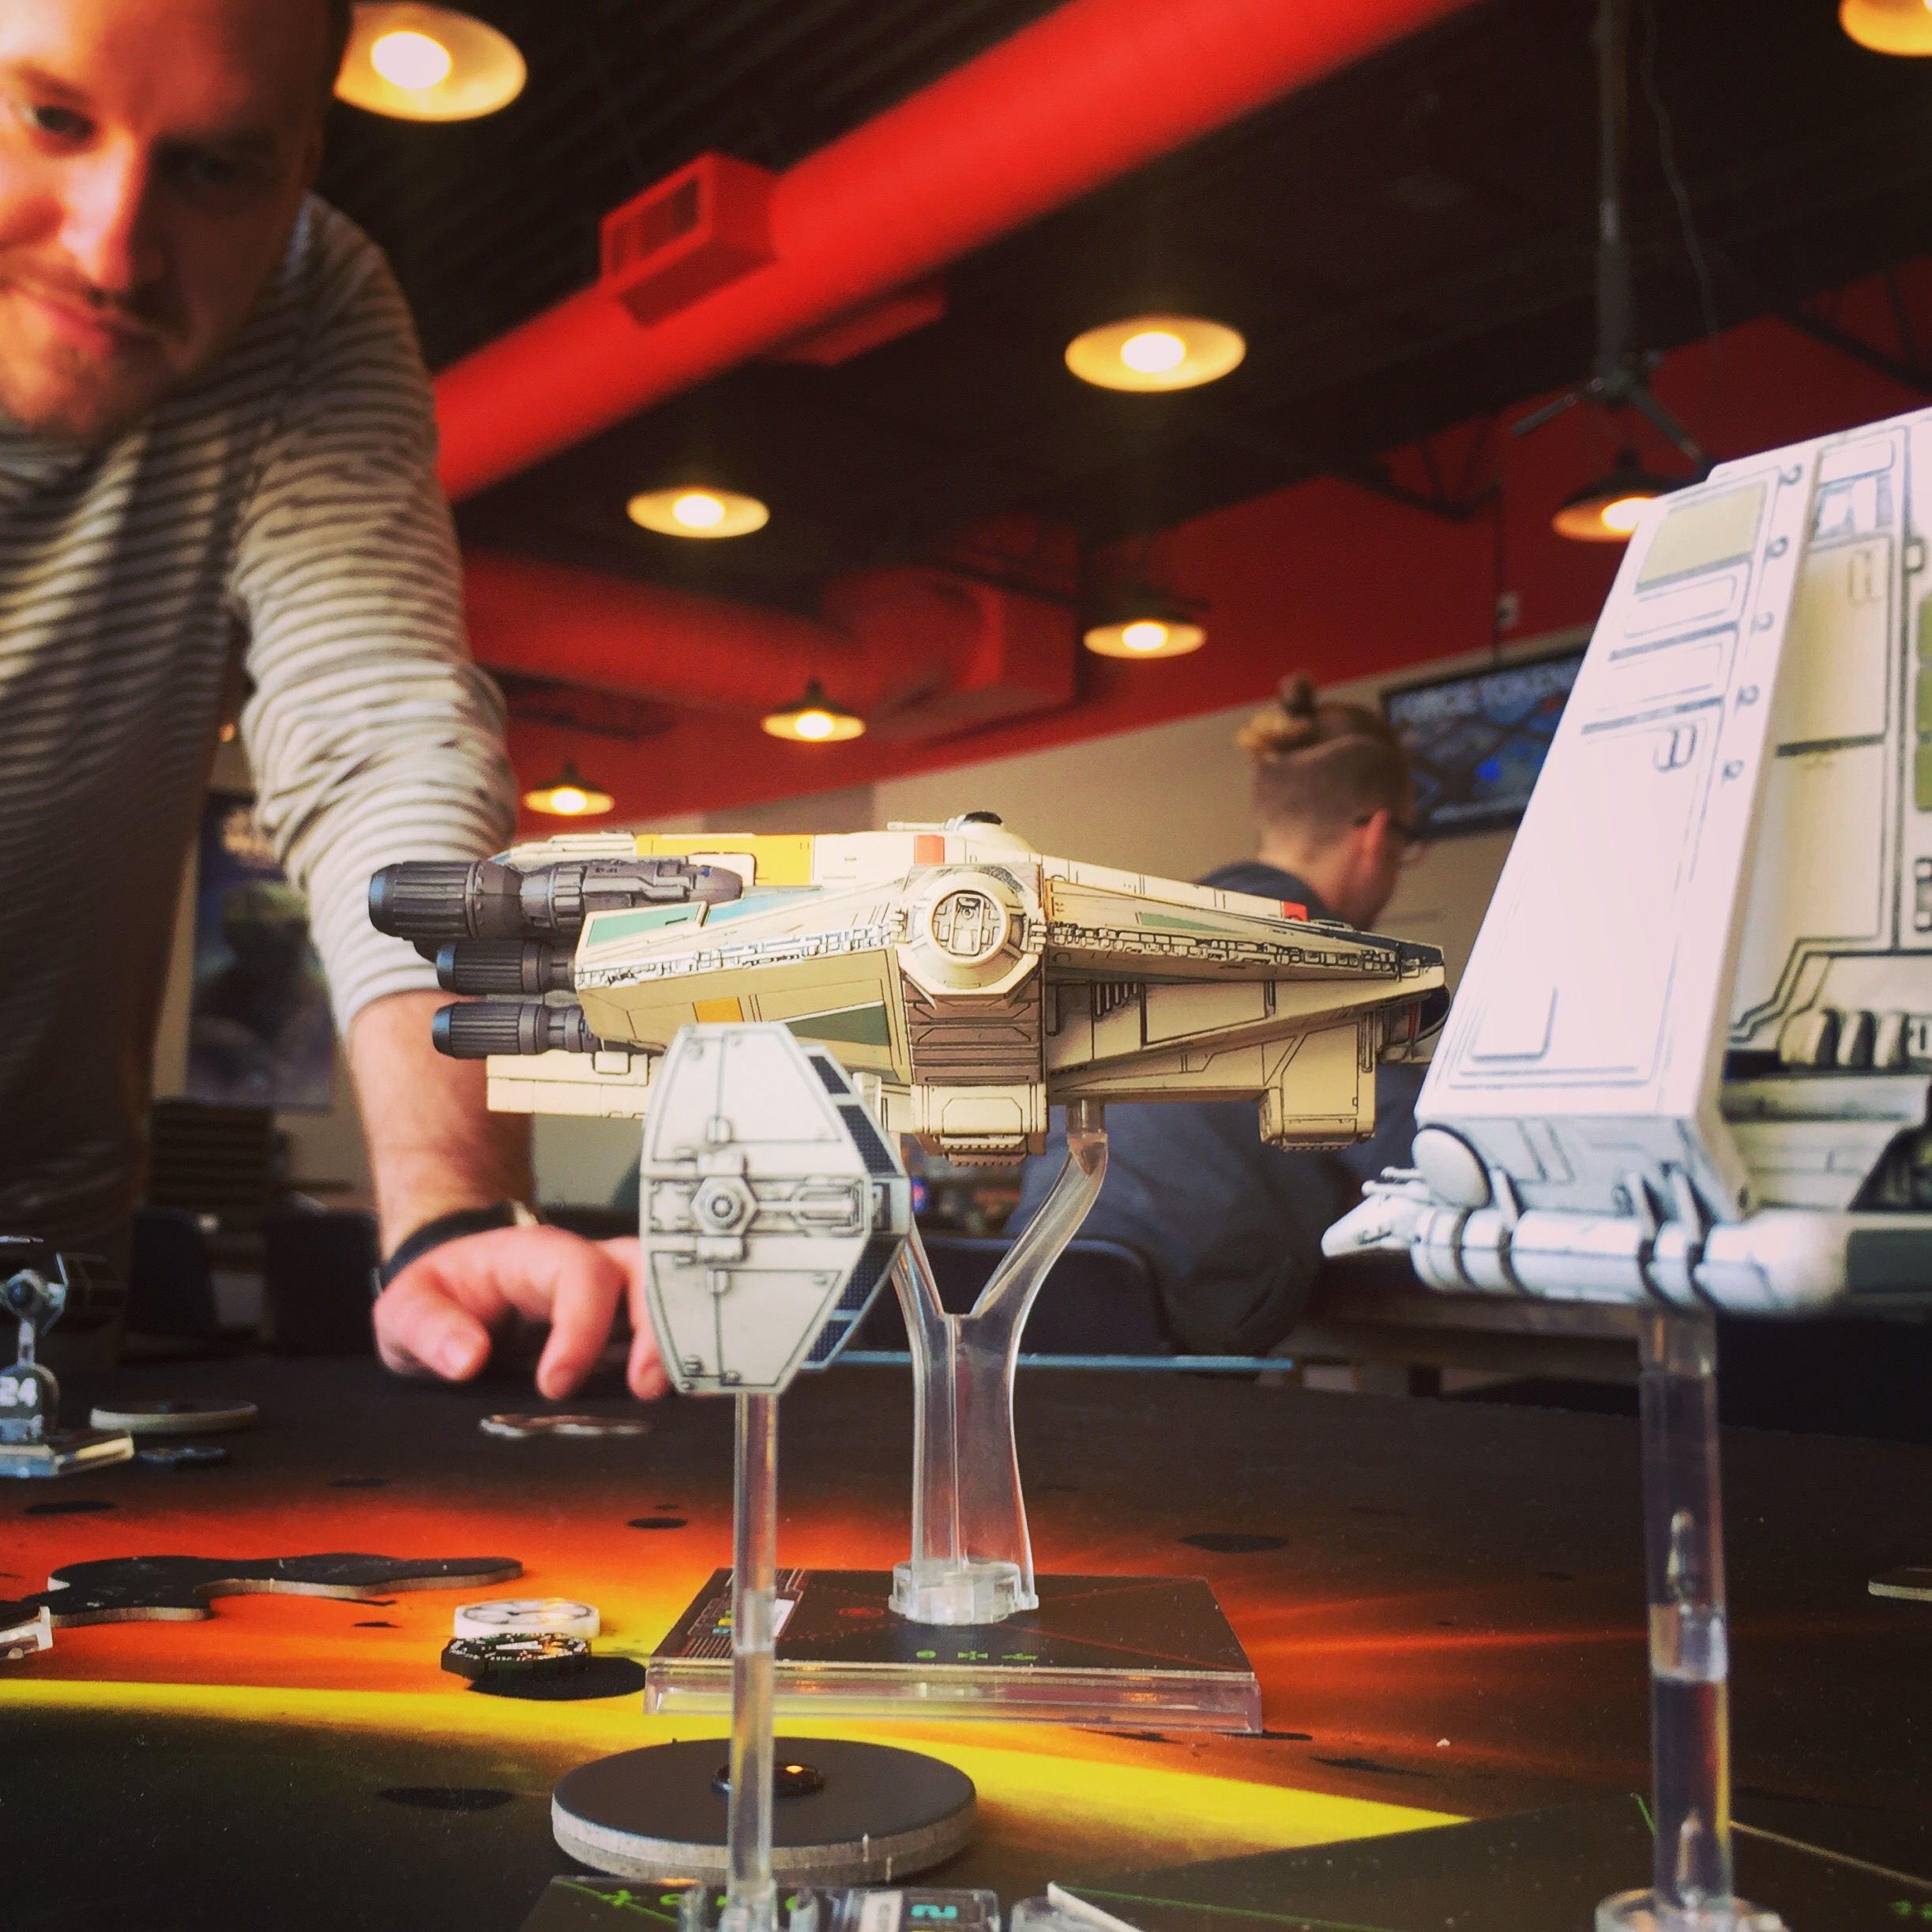 Palp Shuttle - Star Wars X-Wing